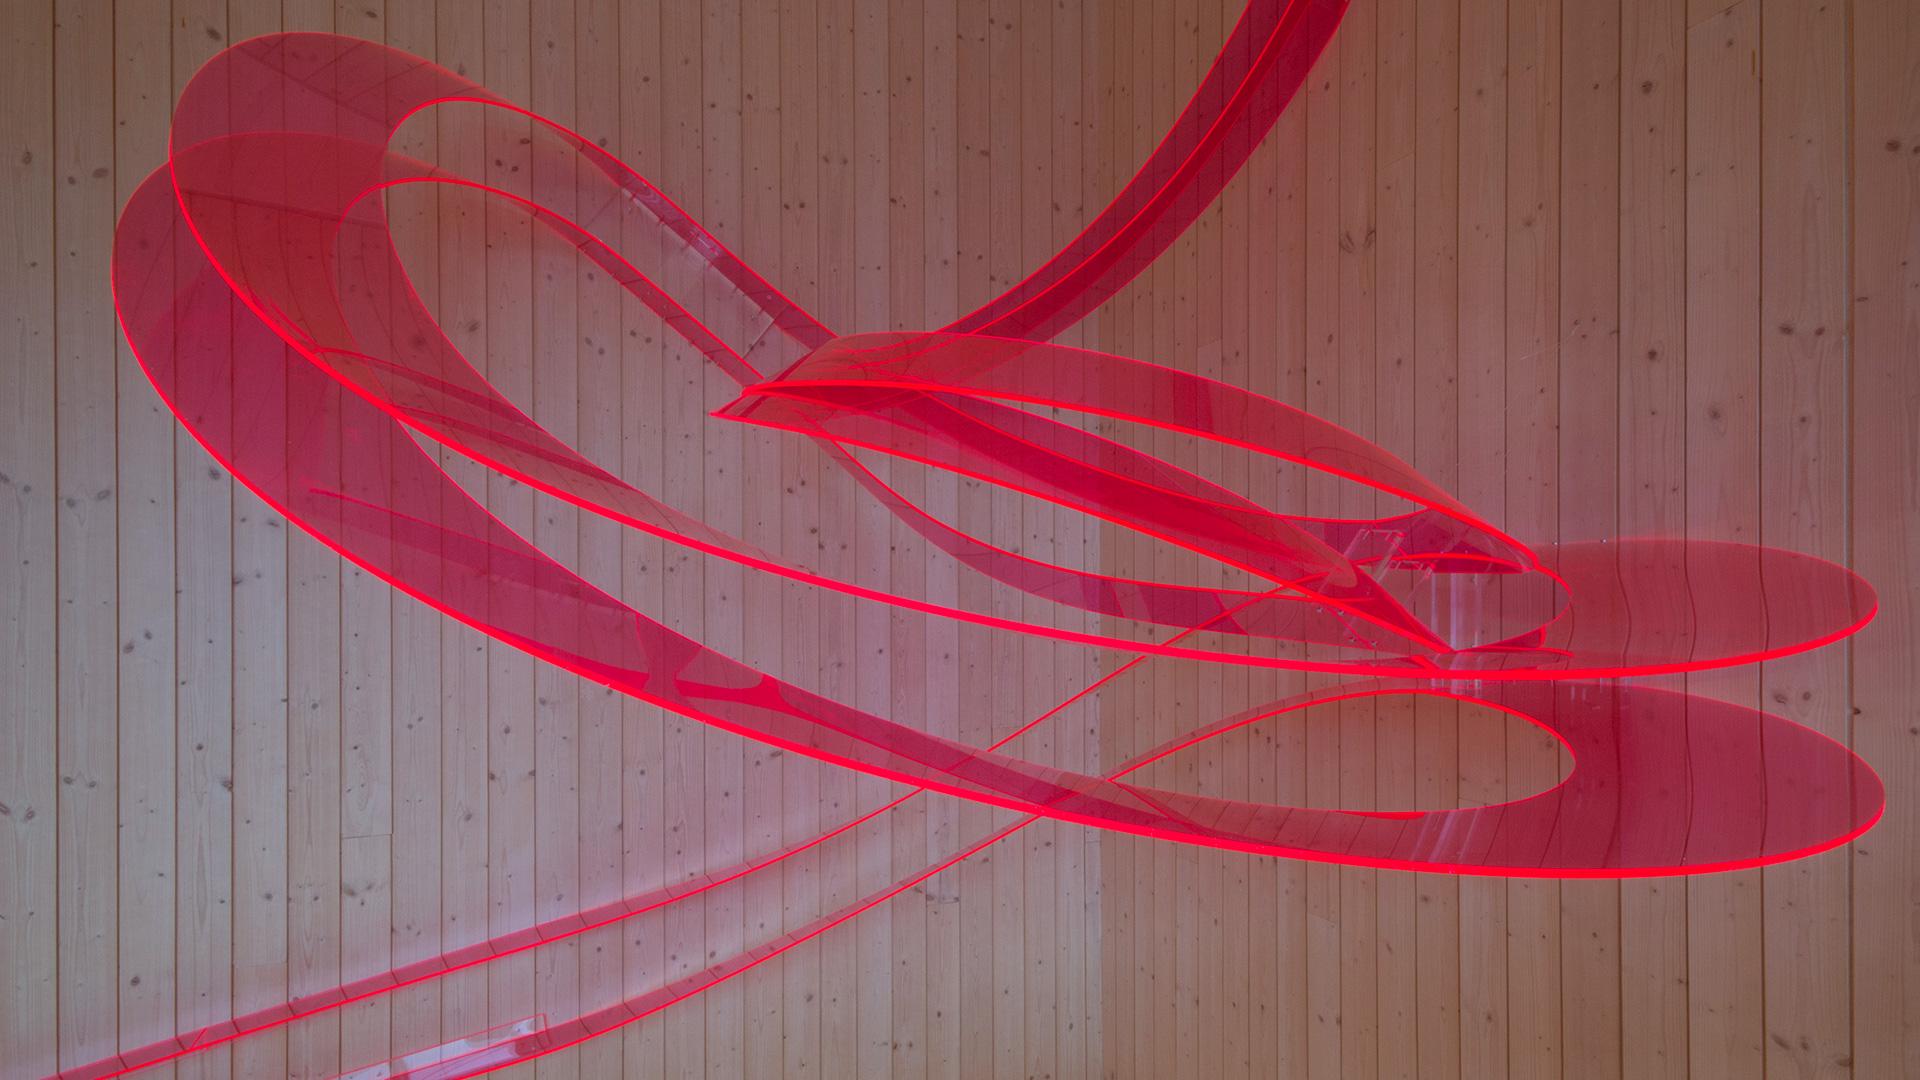 Hverdagsbevegelser, - skulptur / Daily Transitions, - sculpture